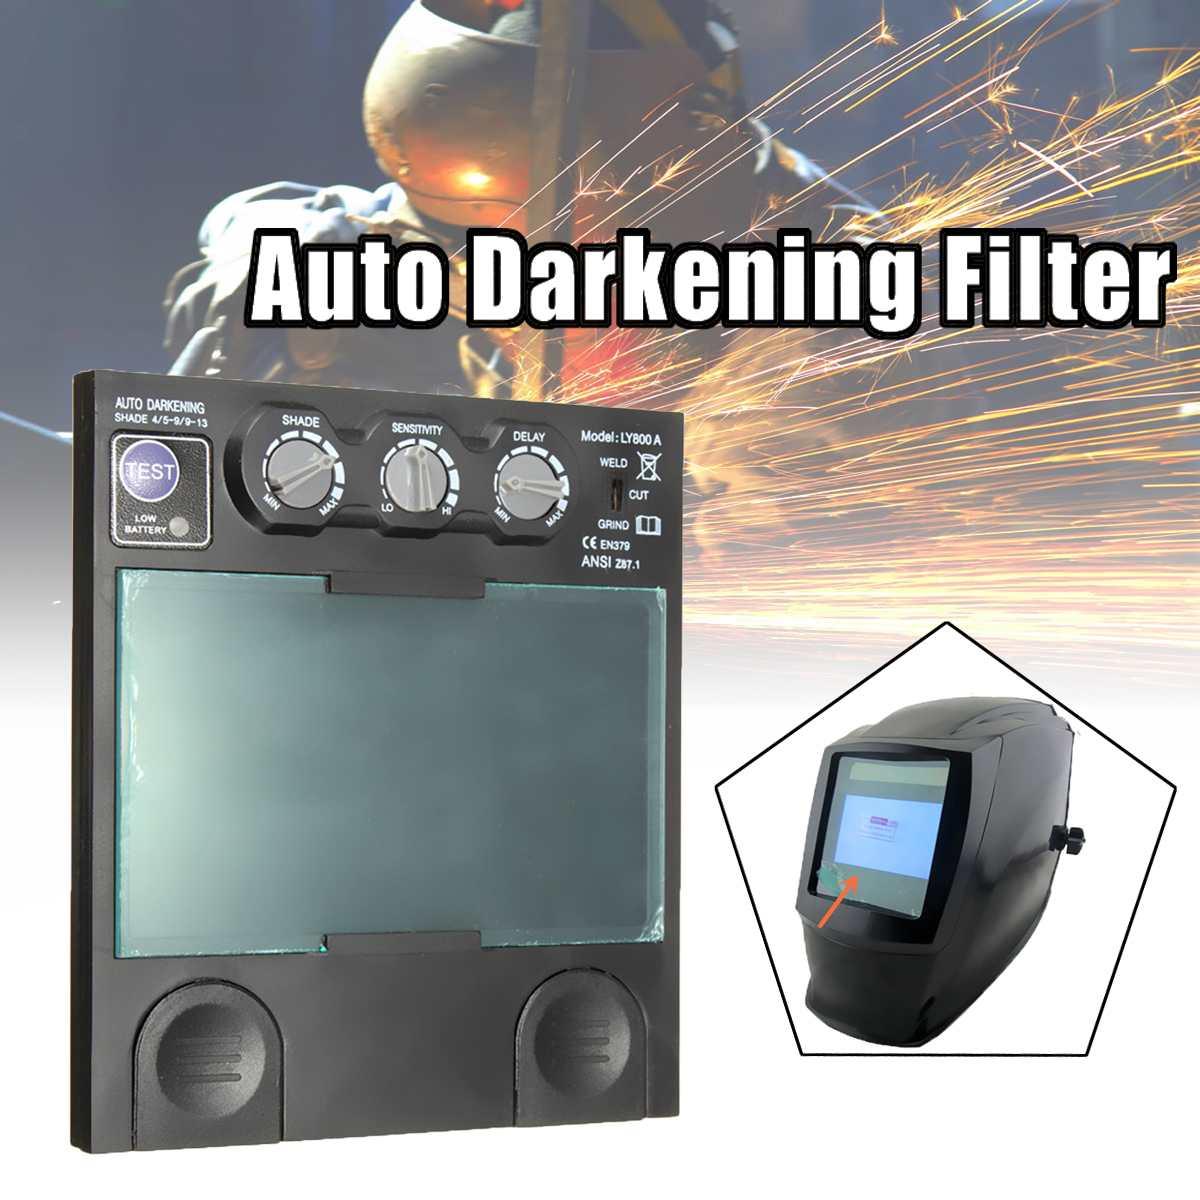 1pcs Solar Auto Darkening Big View Area 4 Arc Sensor Helmet Lens TIG MIG Filter Mask Welding Helmet Repair Replace Shield Lens